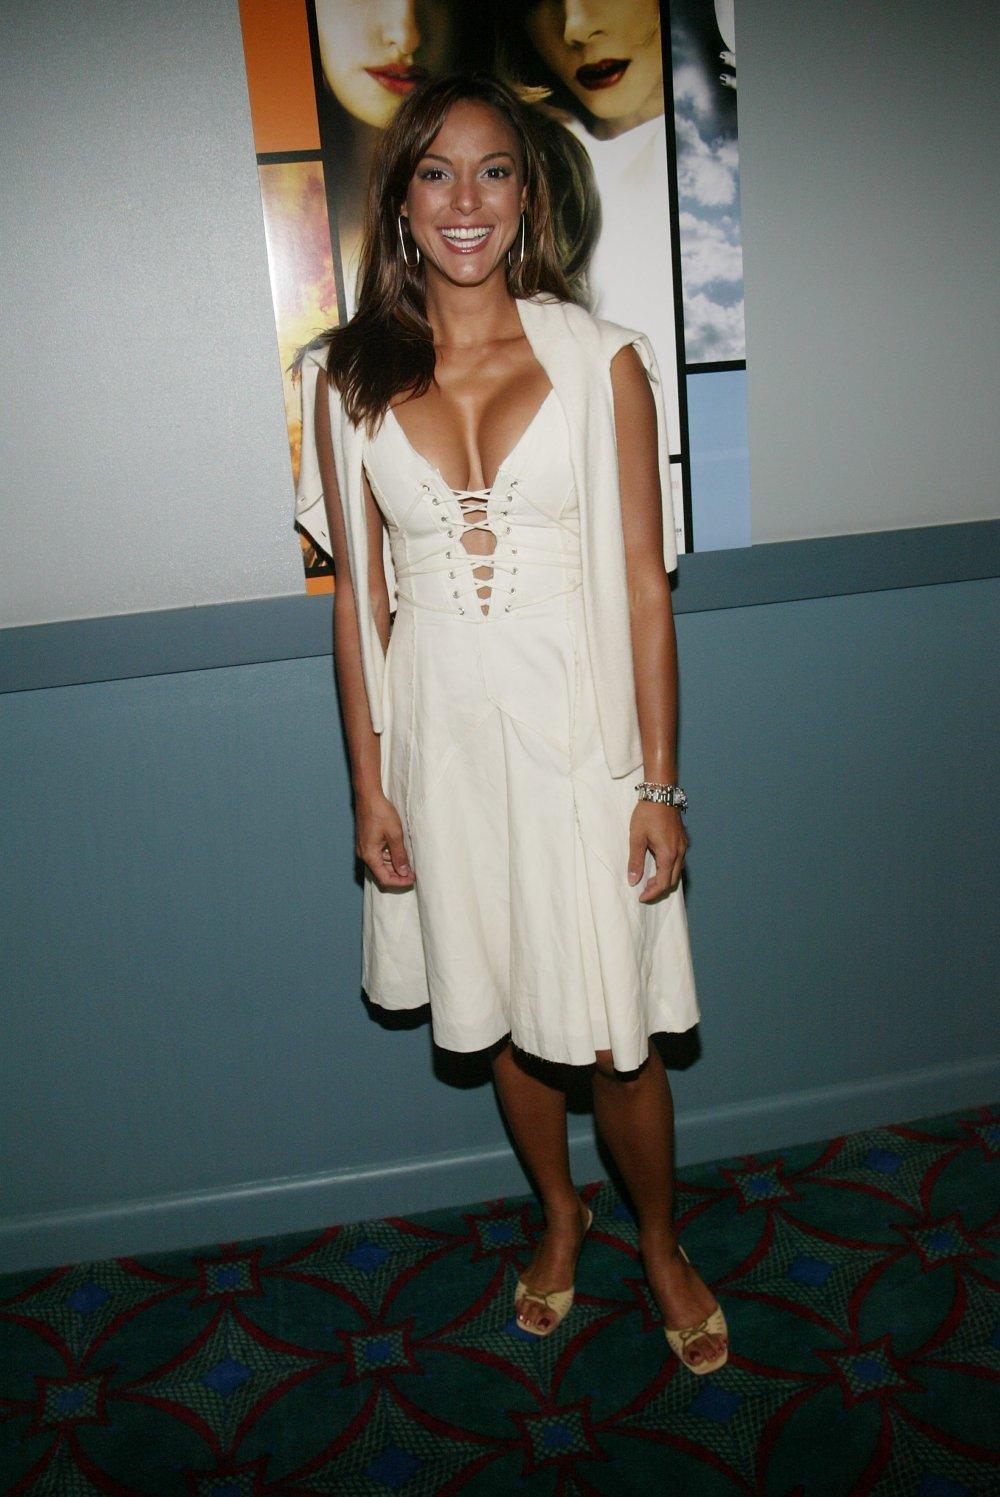 Update 4/24 – Naked fakes of Natalie Portman, Emma